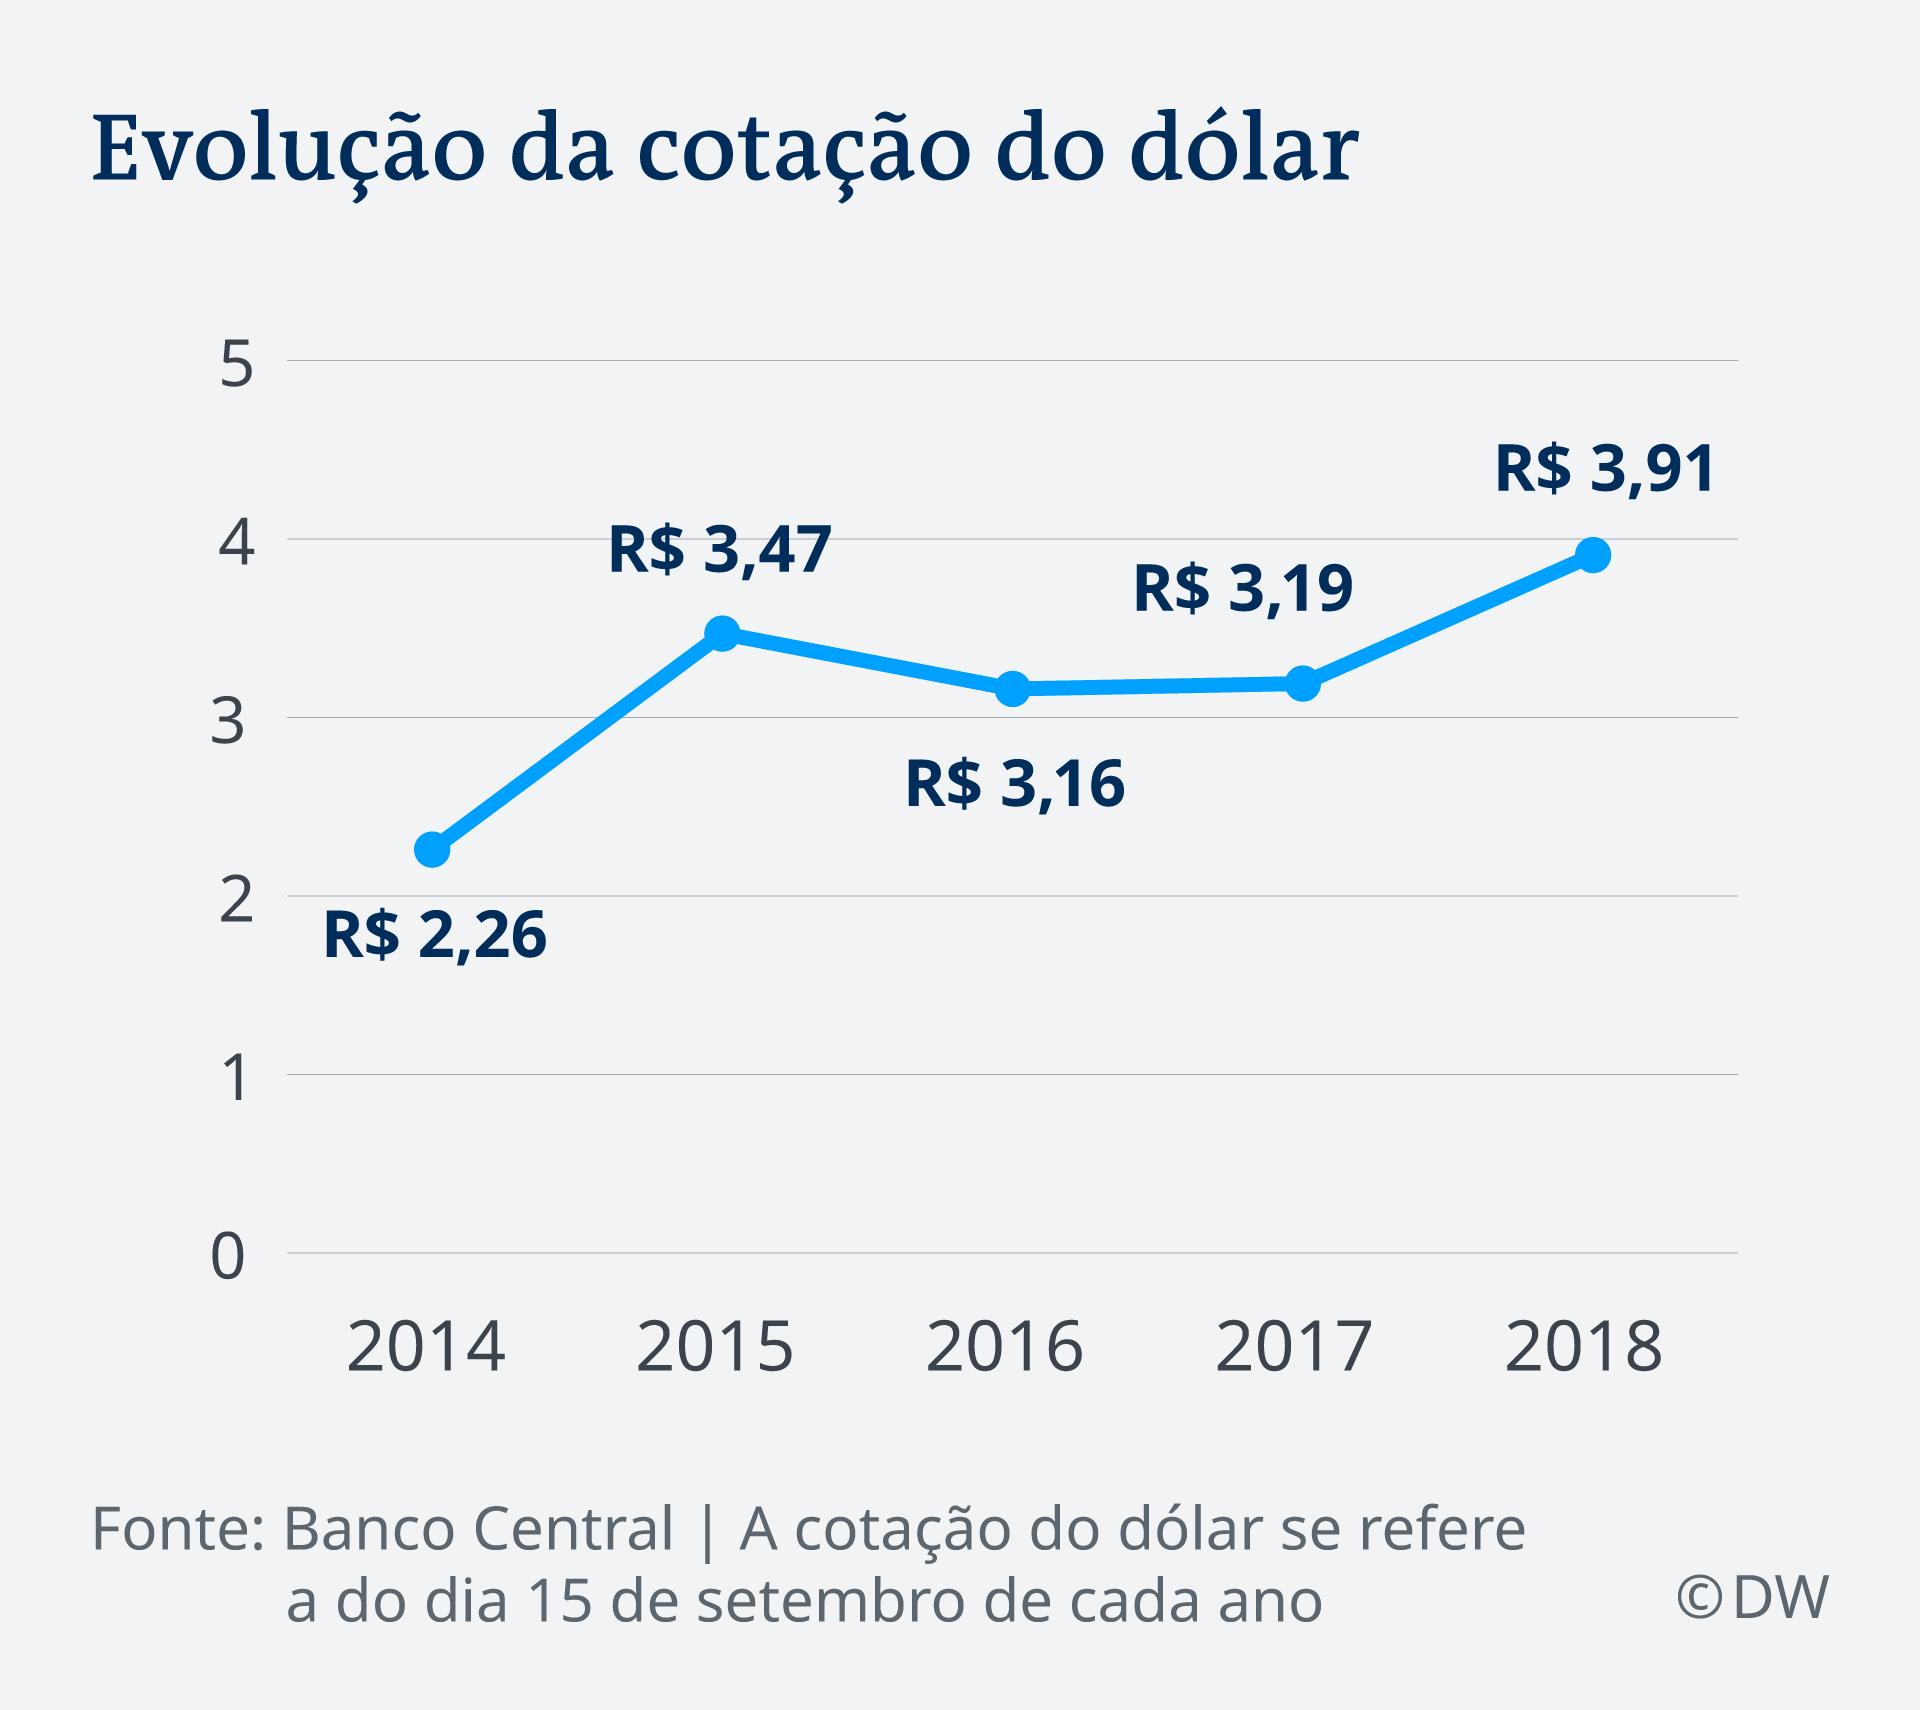 Infografik Entwicklung Dollar Brasilianischer Real 2014 - 2018 PT